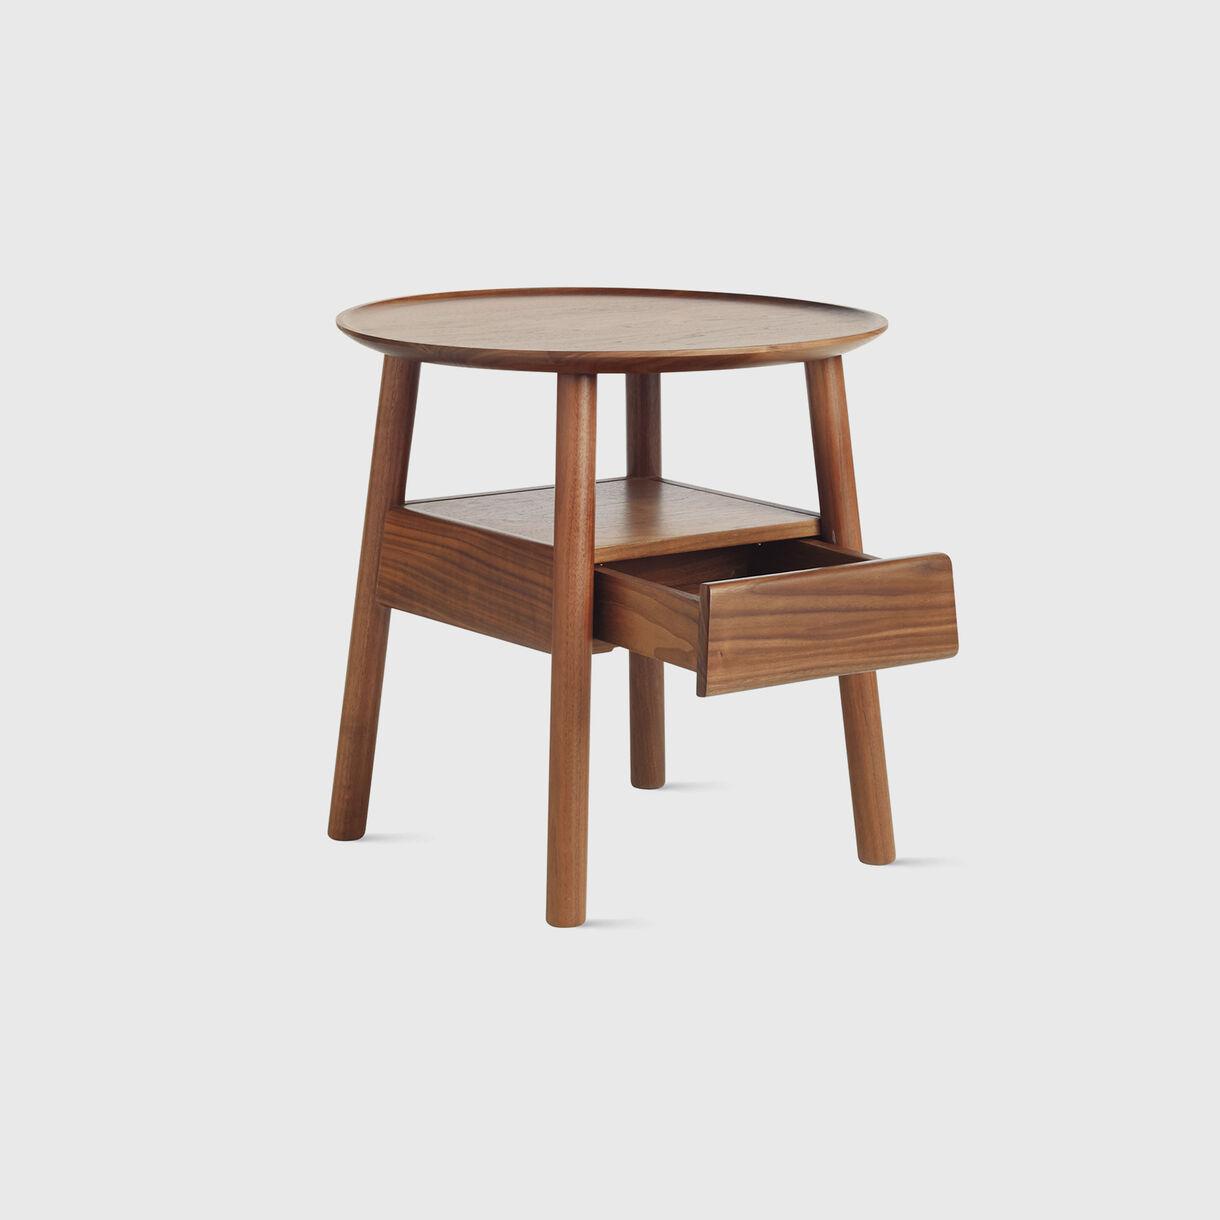 Edge Bedside Table, Walnut